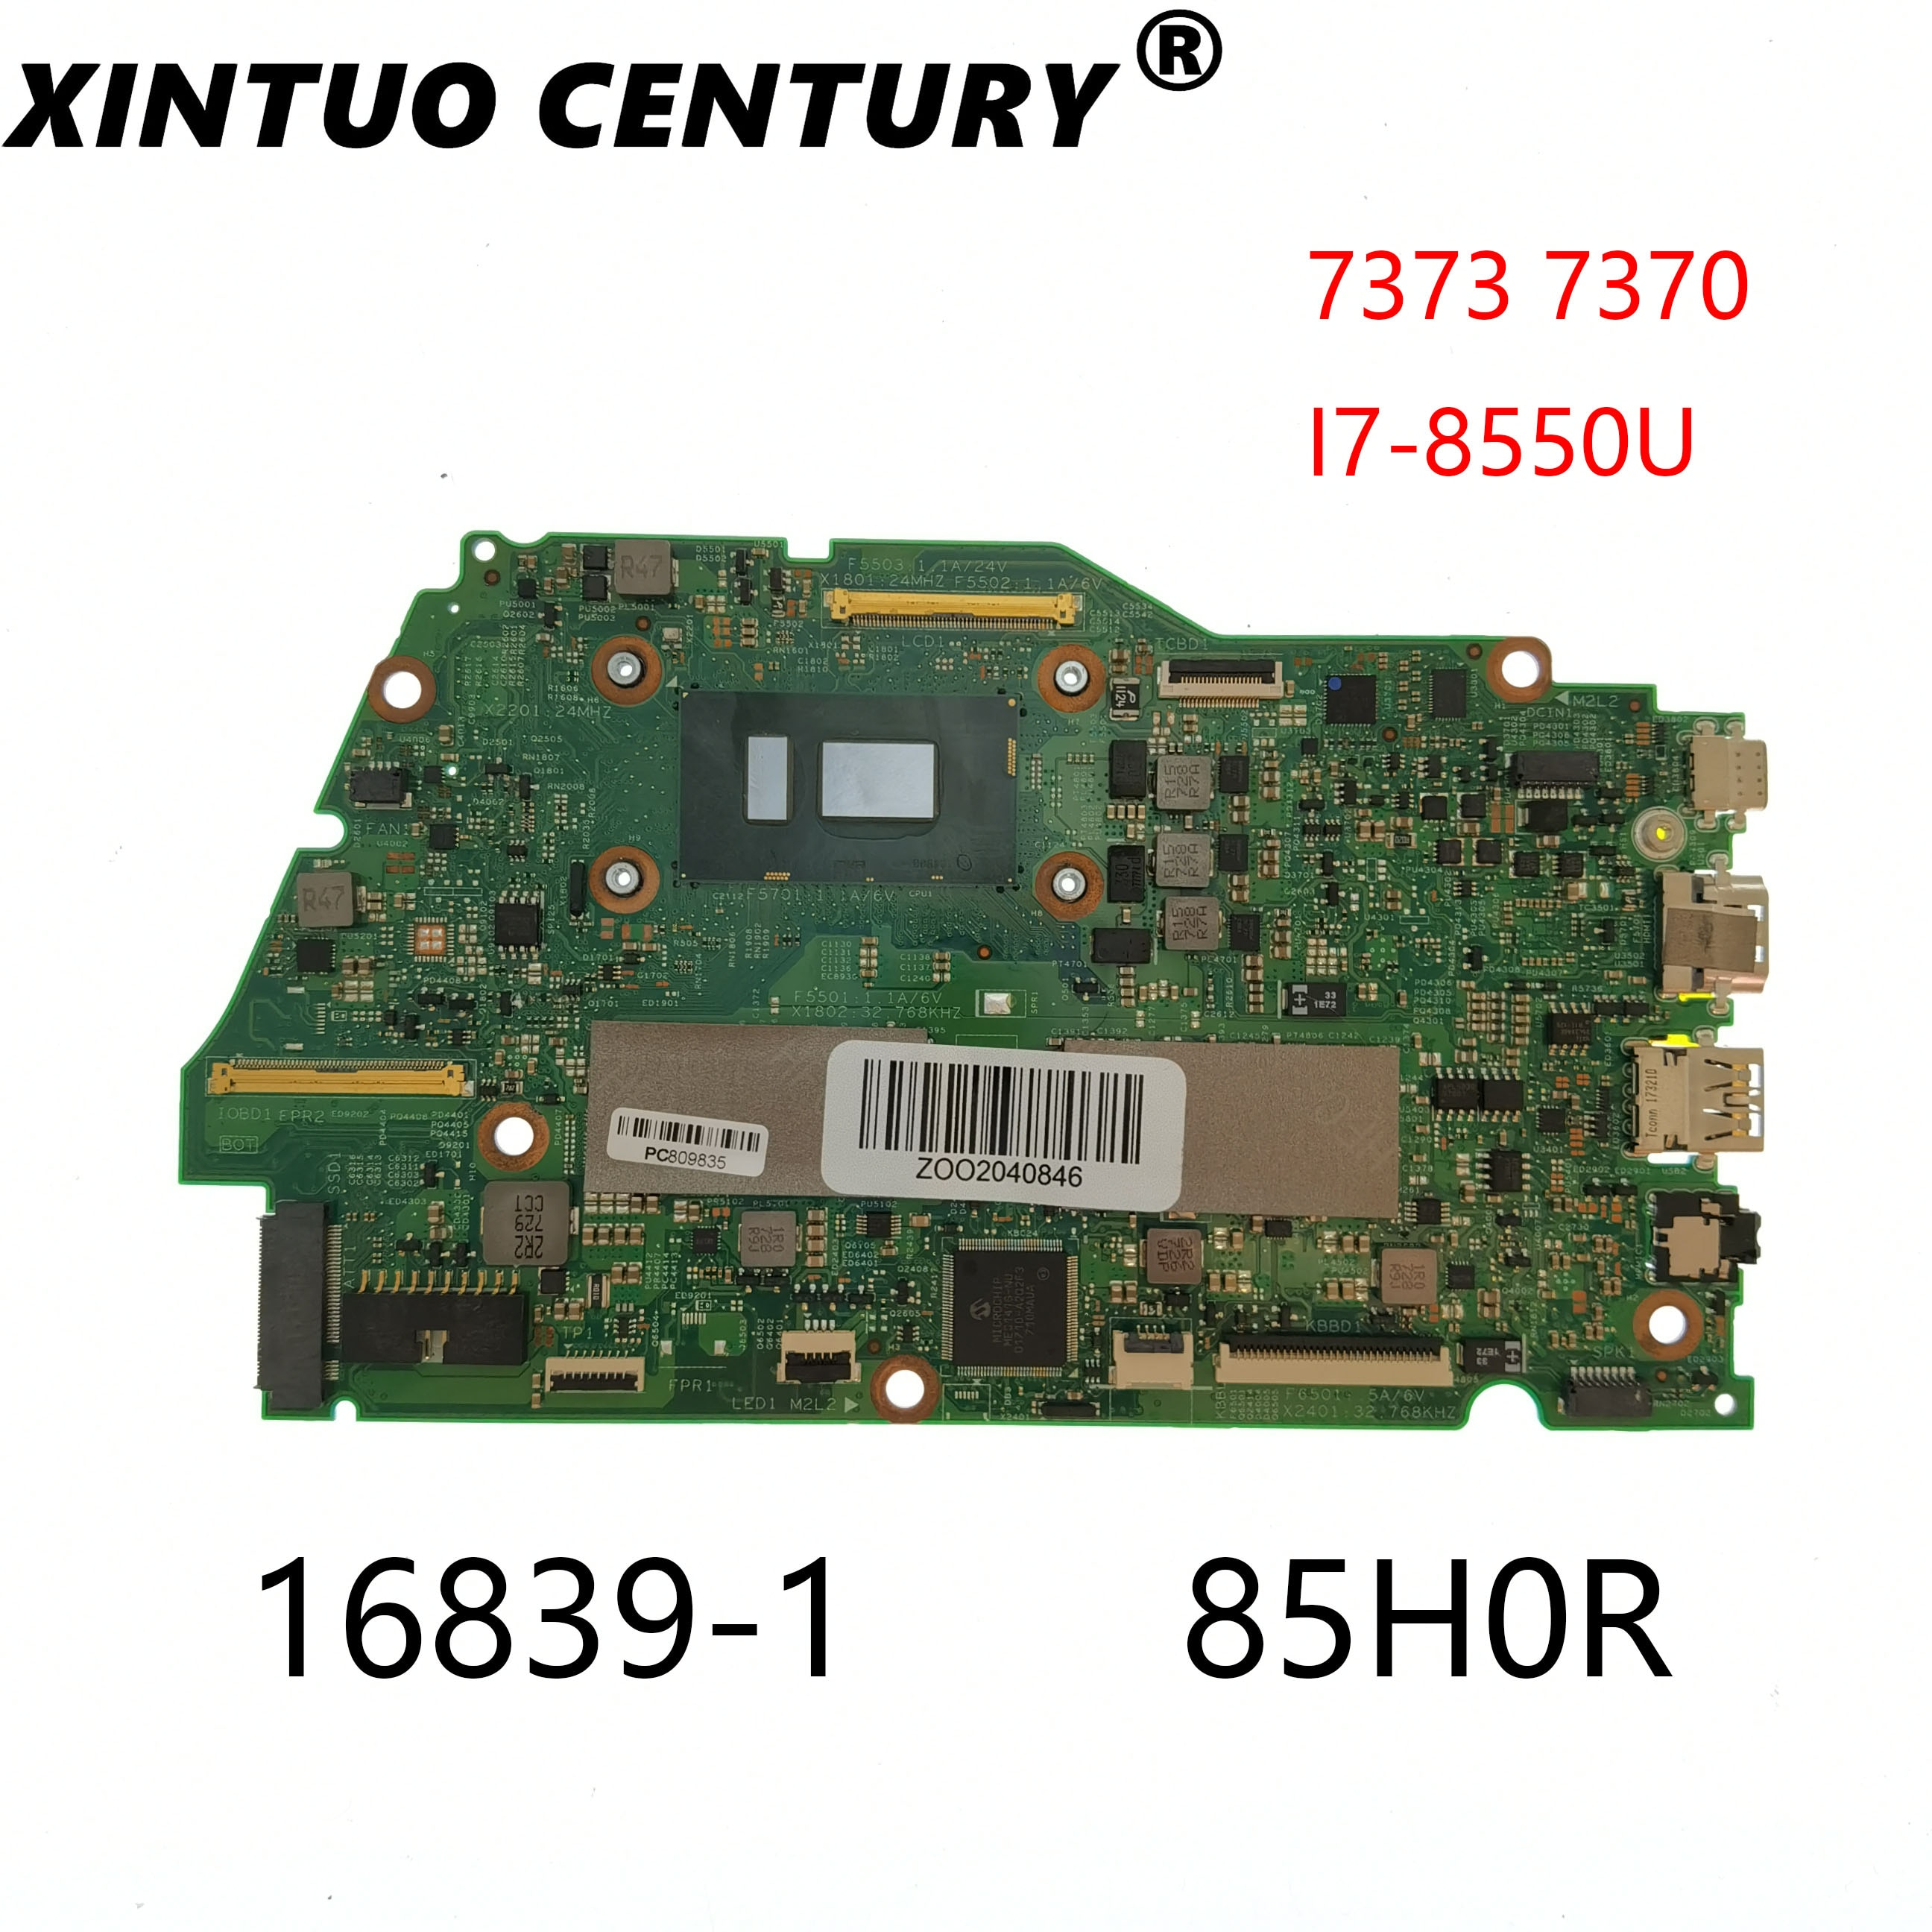 CN-085H0R 085H0R 85H0R لديل انسبايرون 7370 7373 كمبيوتر محمول اللوحة 16839-1 Y5HR3 W/ i7-8550U CPU 8GB-RAM 100% اختبار موافق